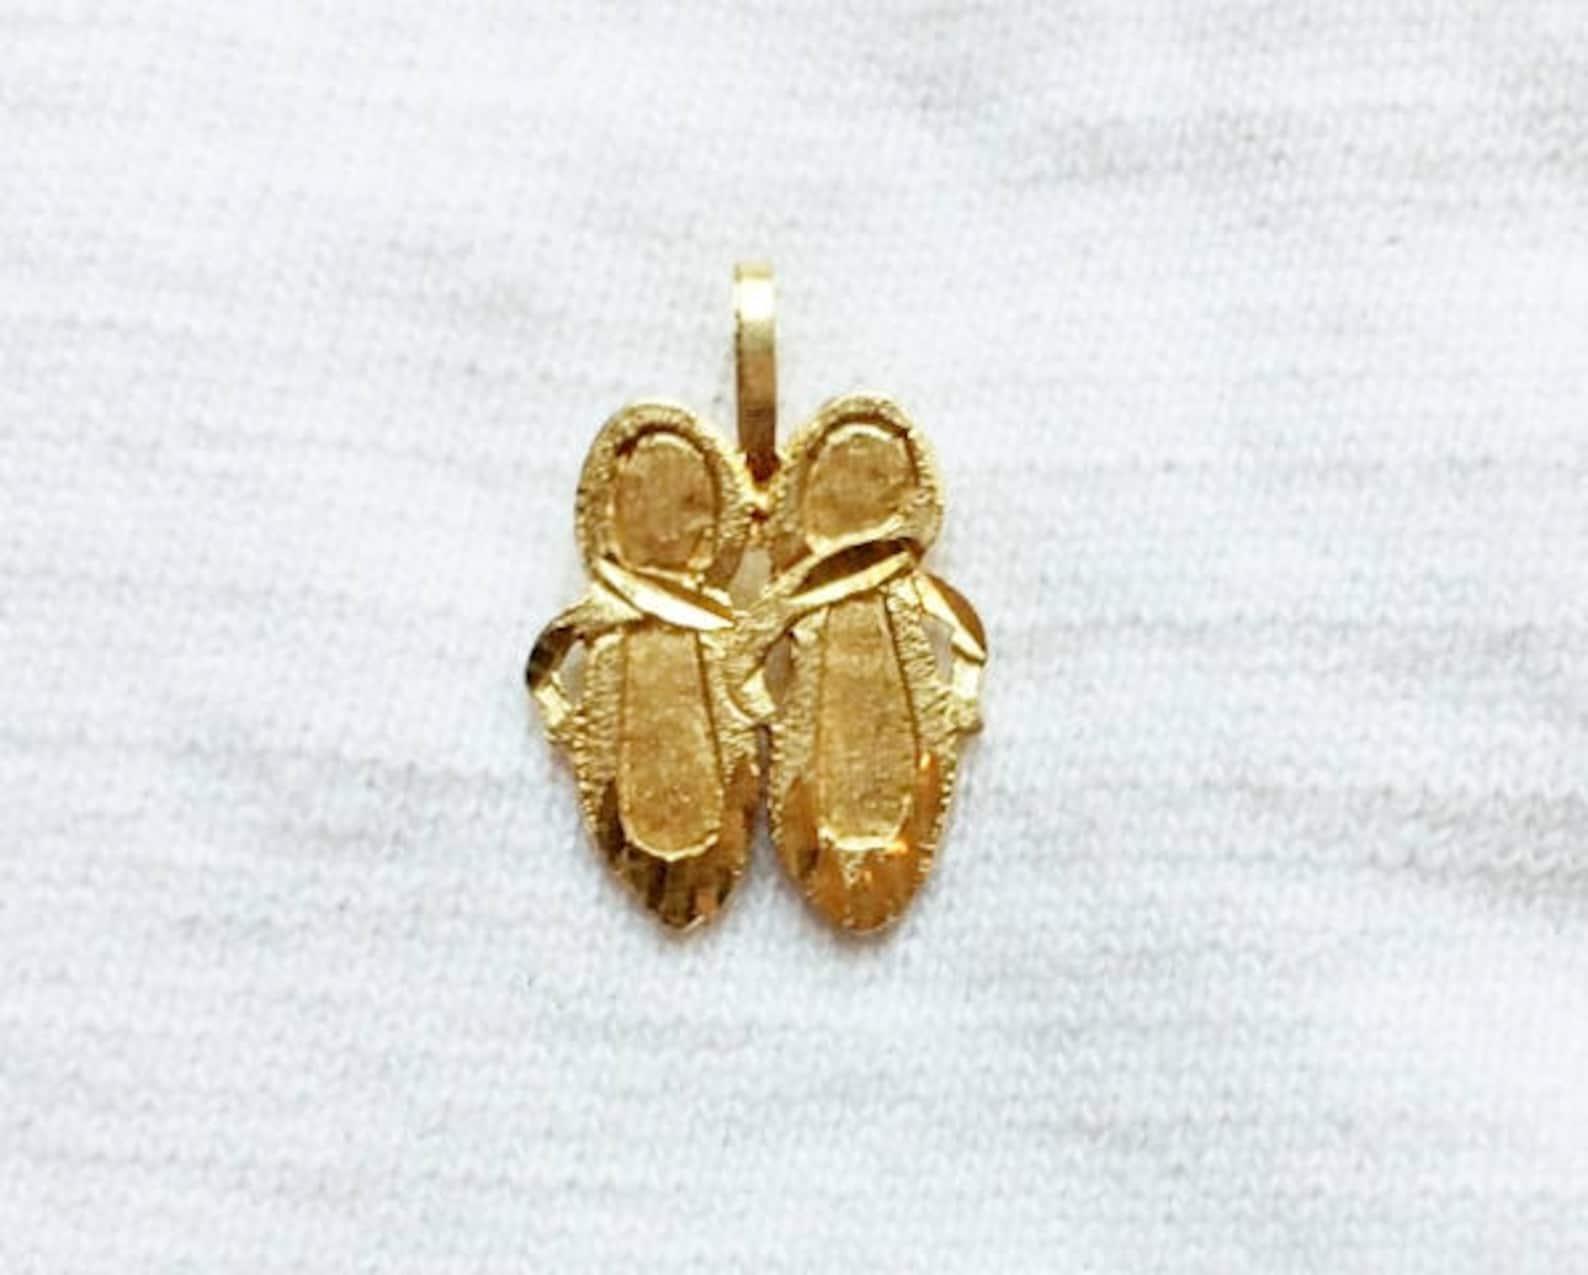 vintage 14k gold ballet shoes pendant for necklace chain embossed diamond pattern estate marked 14 k kt 14kt dance shoe ballerin